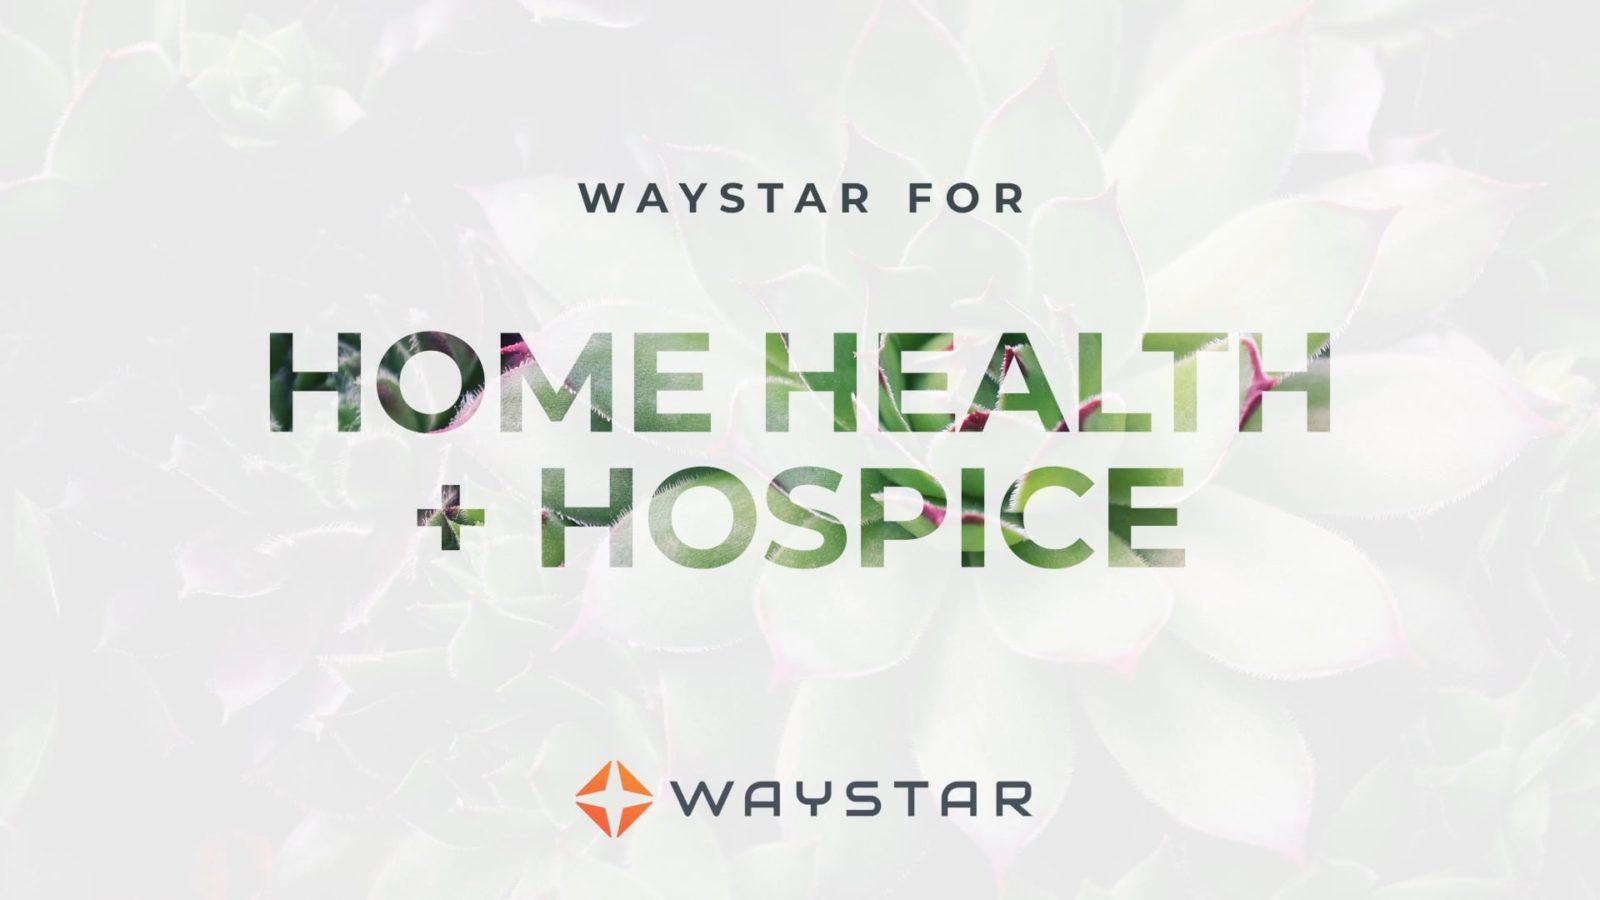 Waystar for Home Health + Hospice